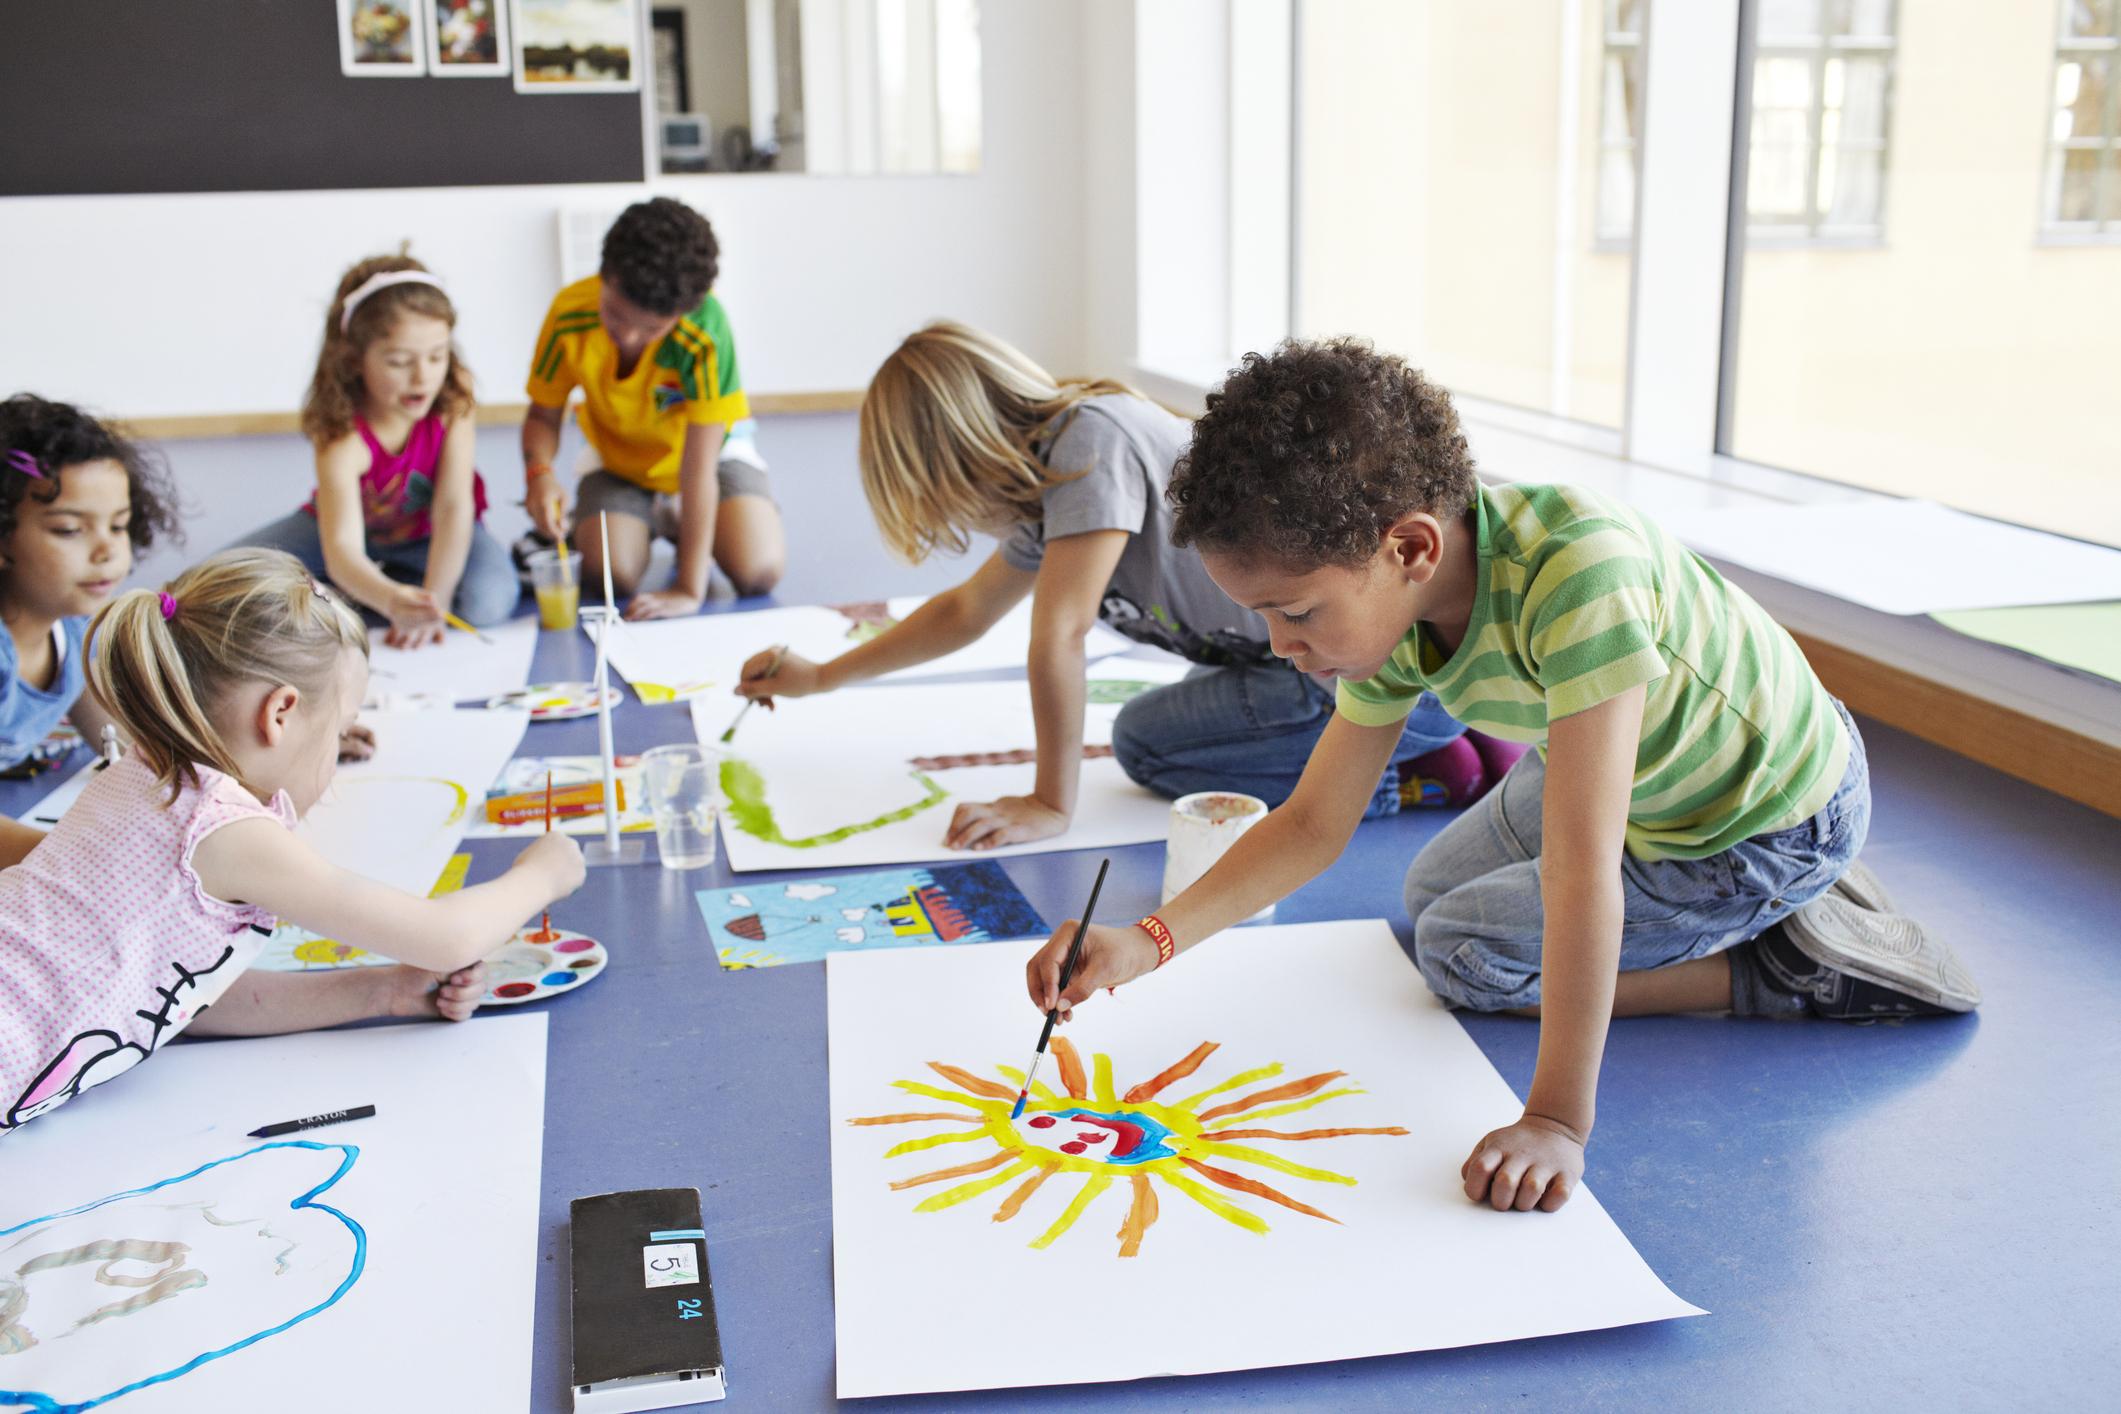 Shot on the floor in creative classroom